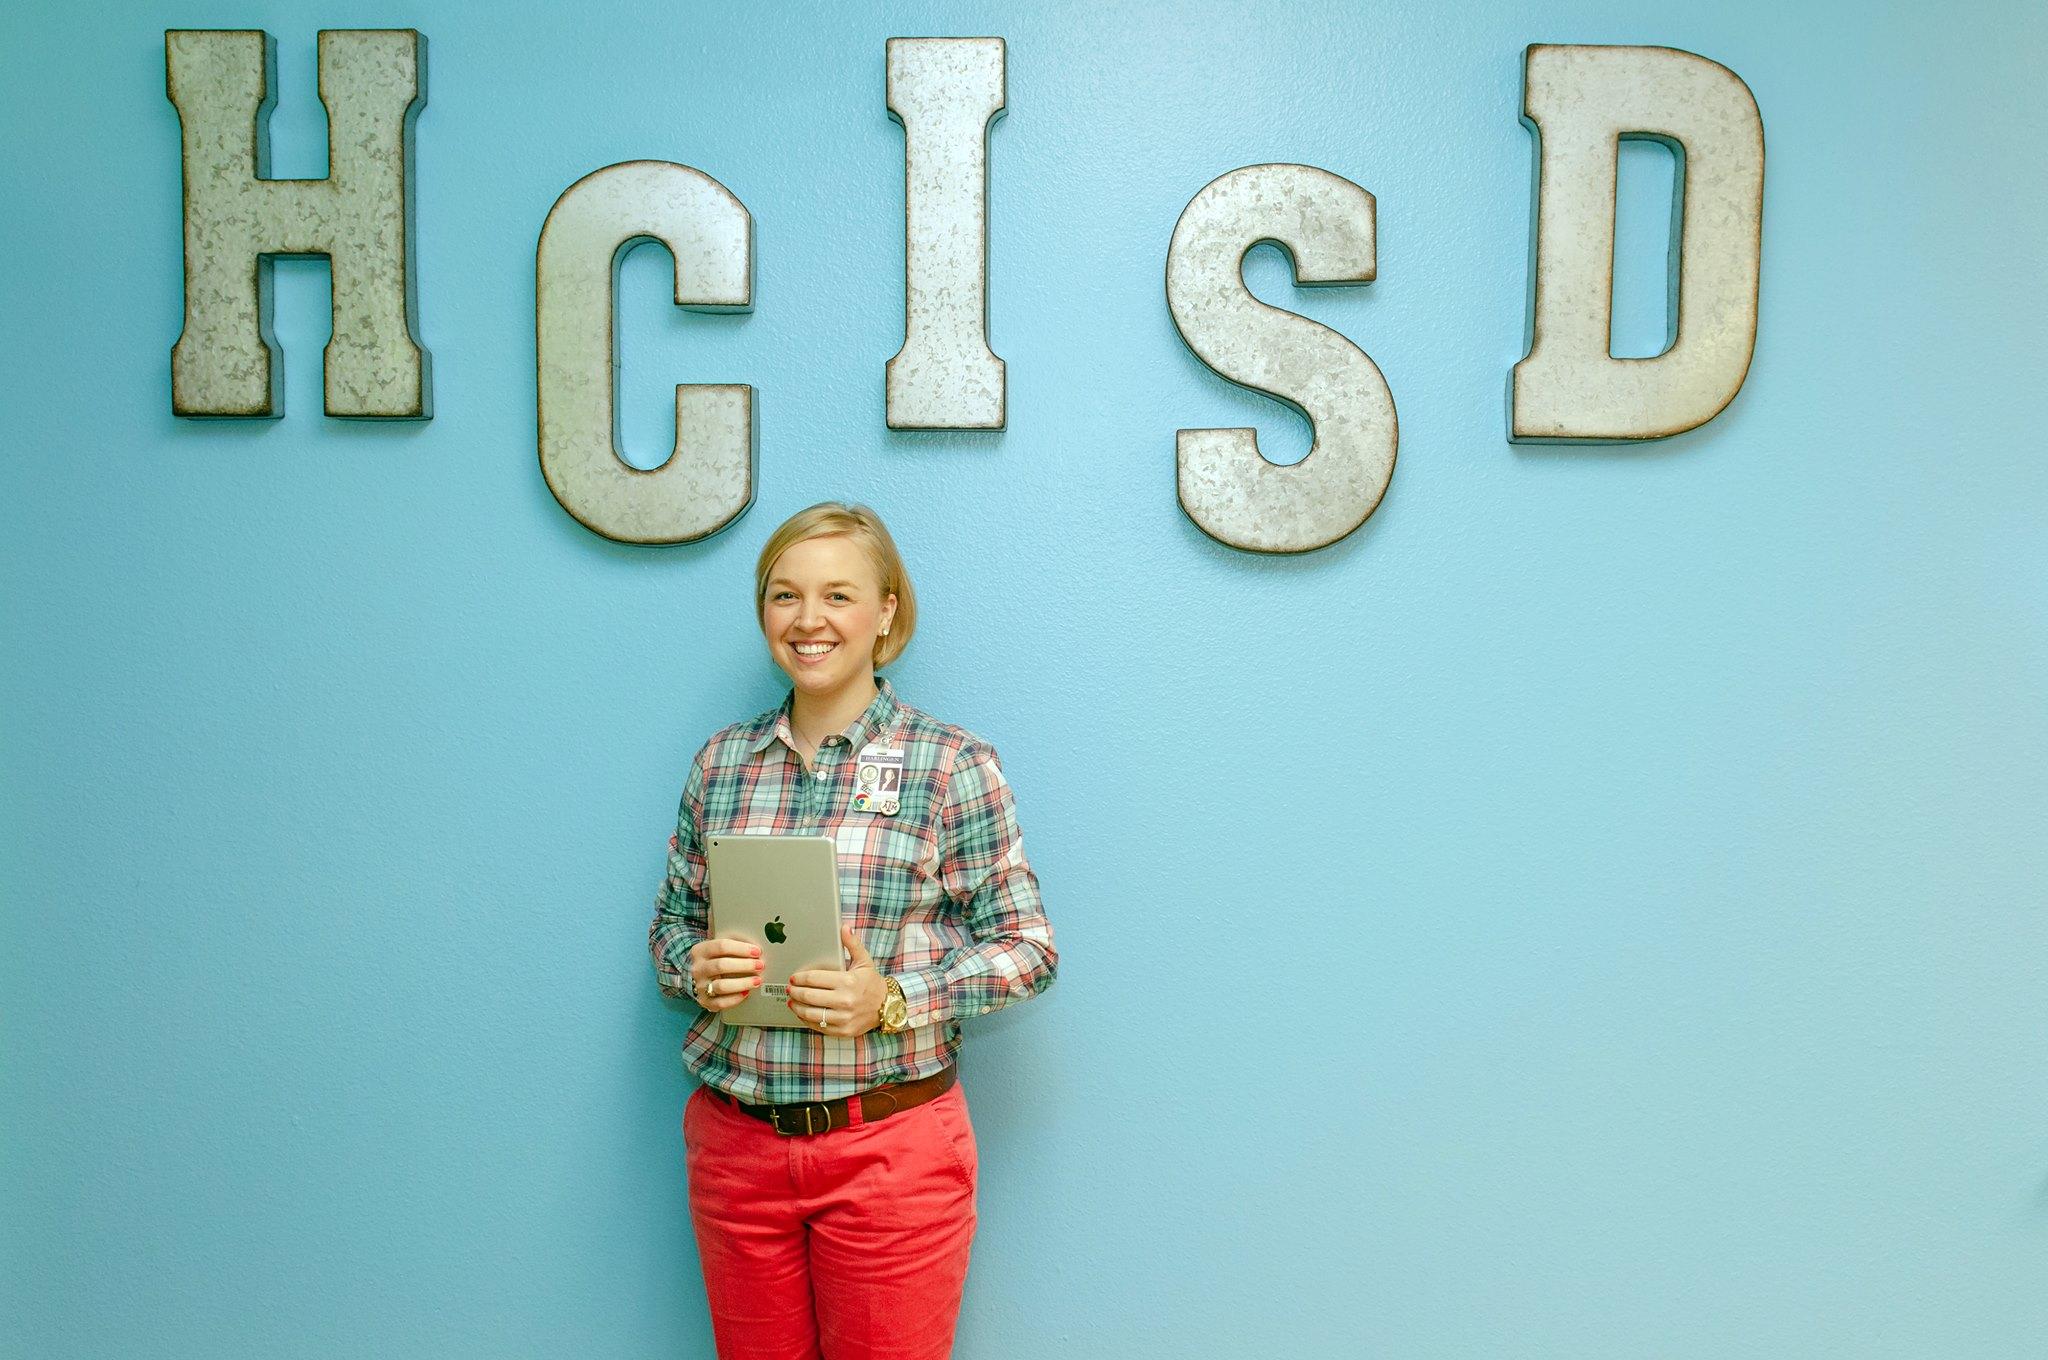 HCISD Instructional Technologist named Apple Distinguished Educator